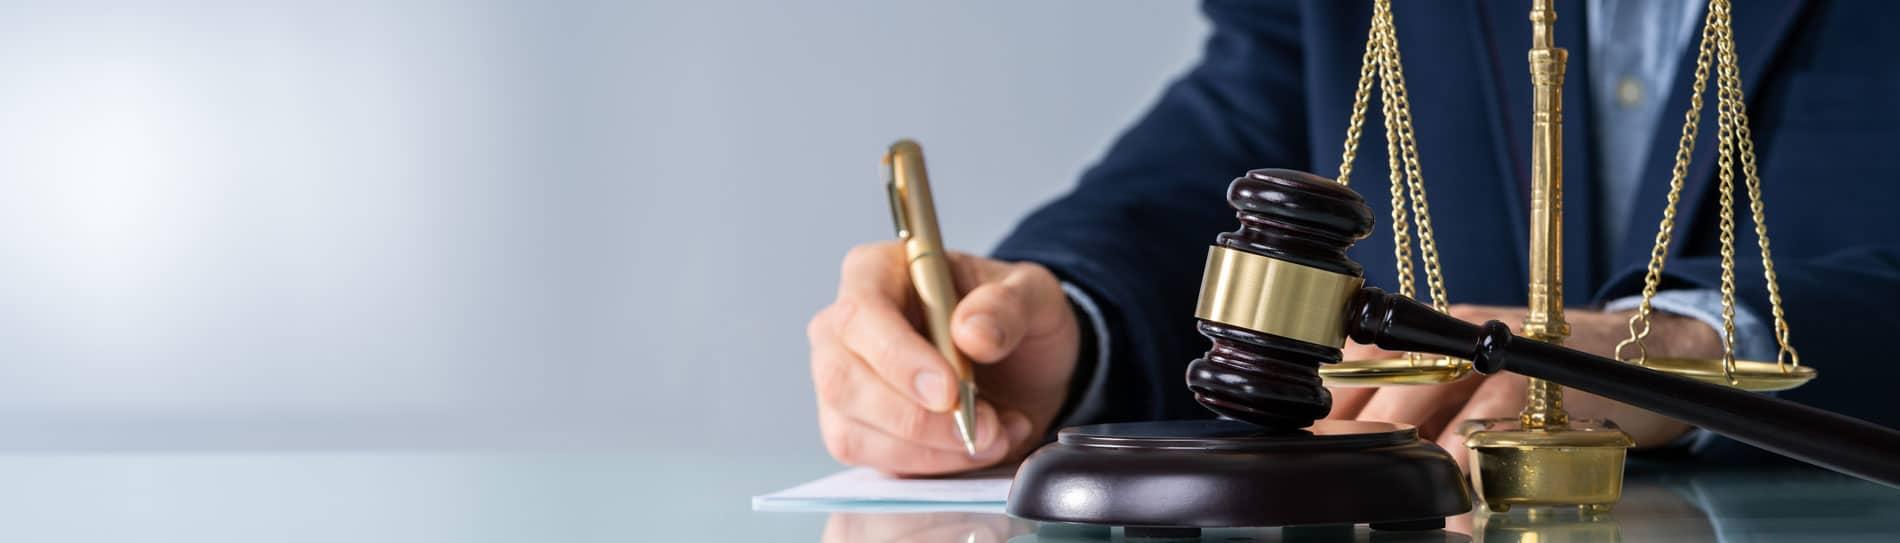 Juridische afwikkeling